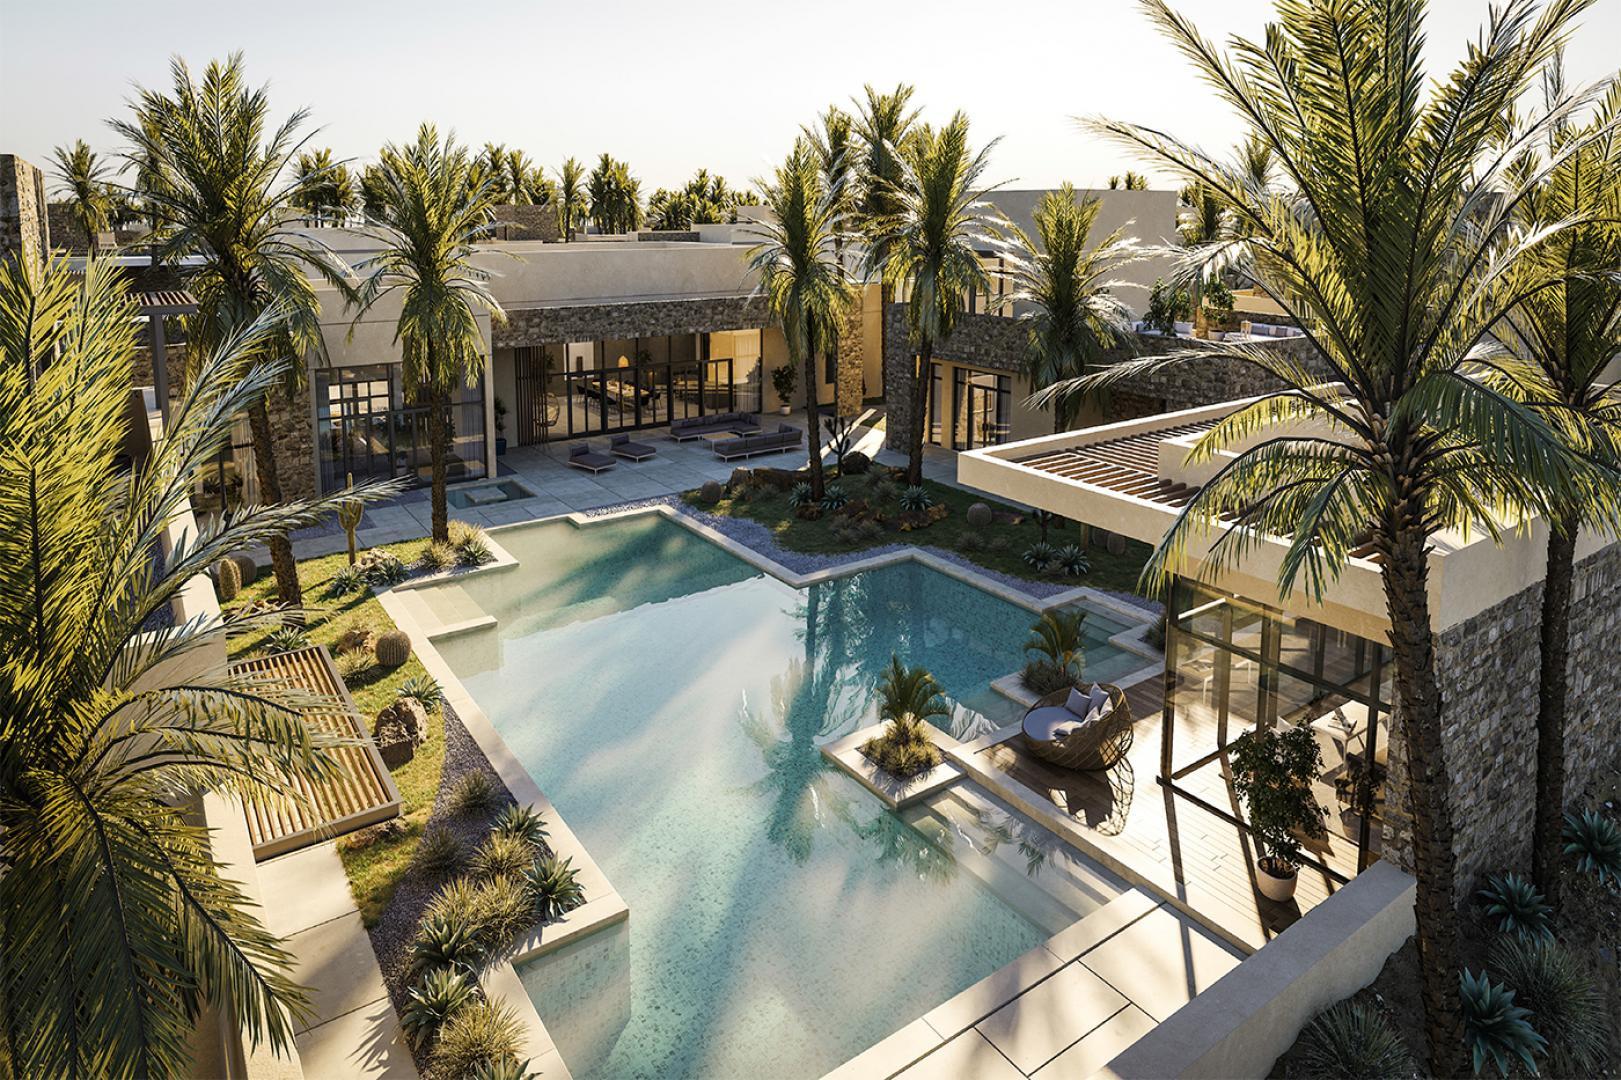 al-jurf-villa-gardens-abu-dhabi-pool